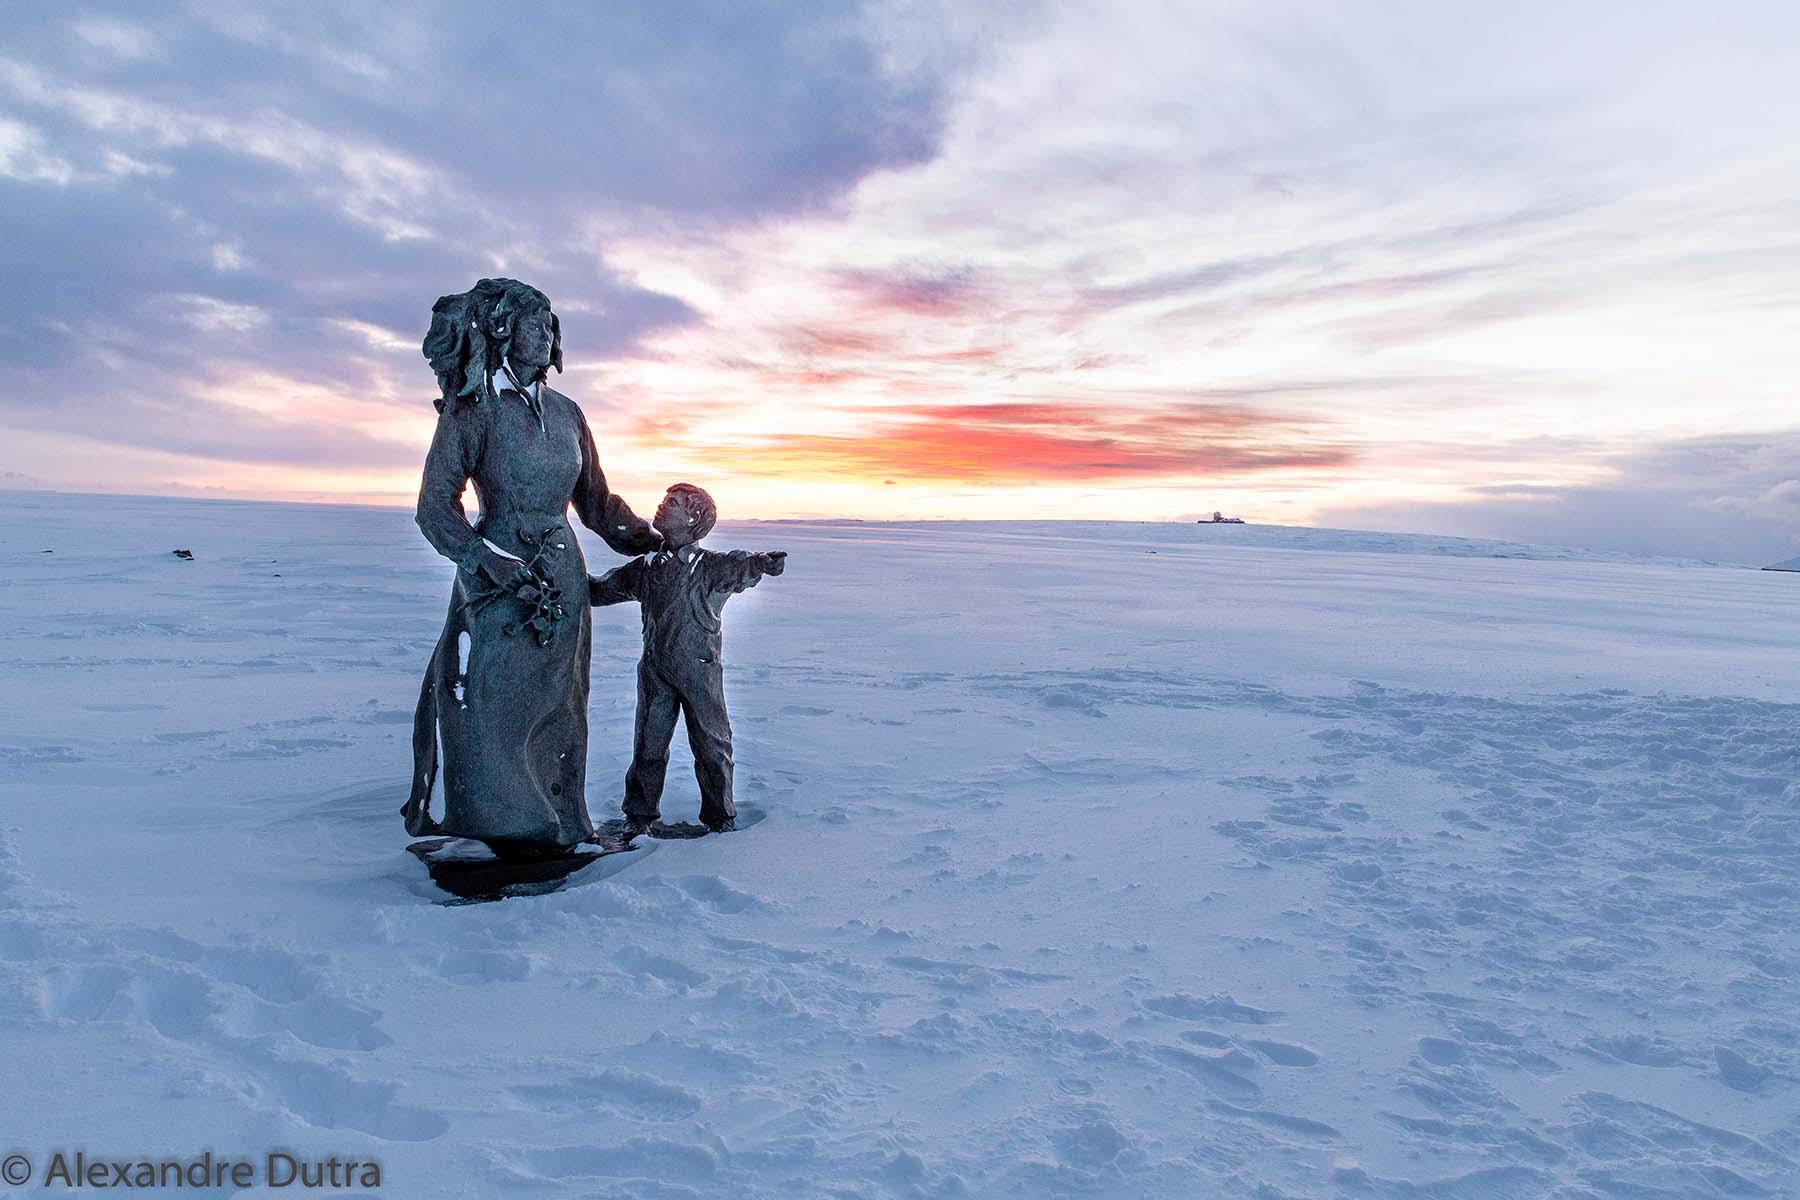 Monumento em Nordkapp, Noruega, Lapônia